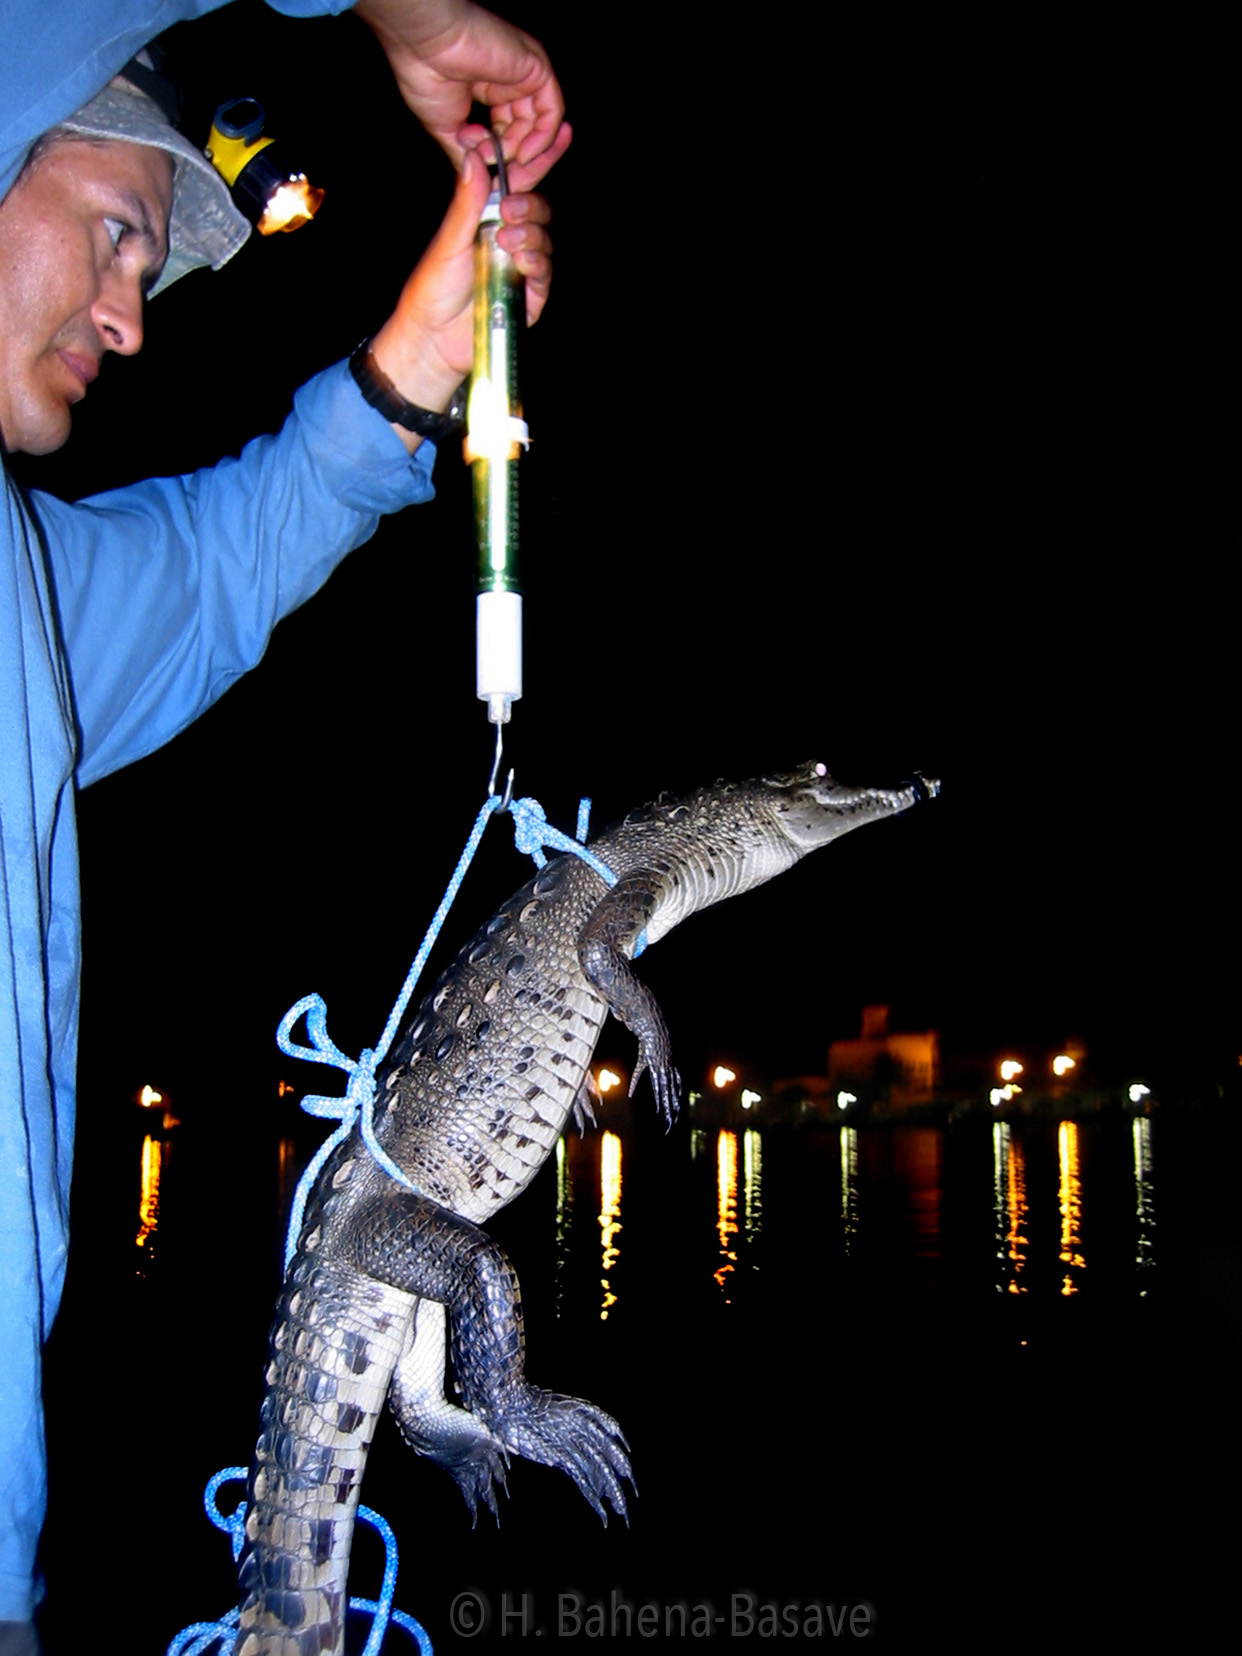 Pesando un cocodrilo